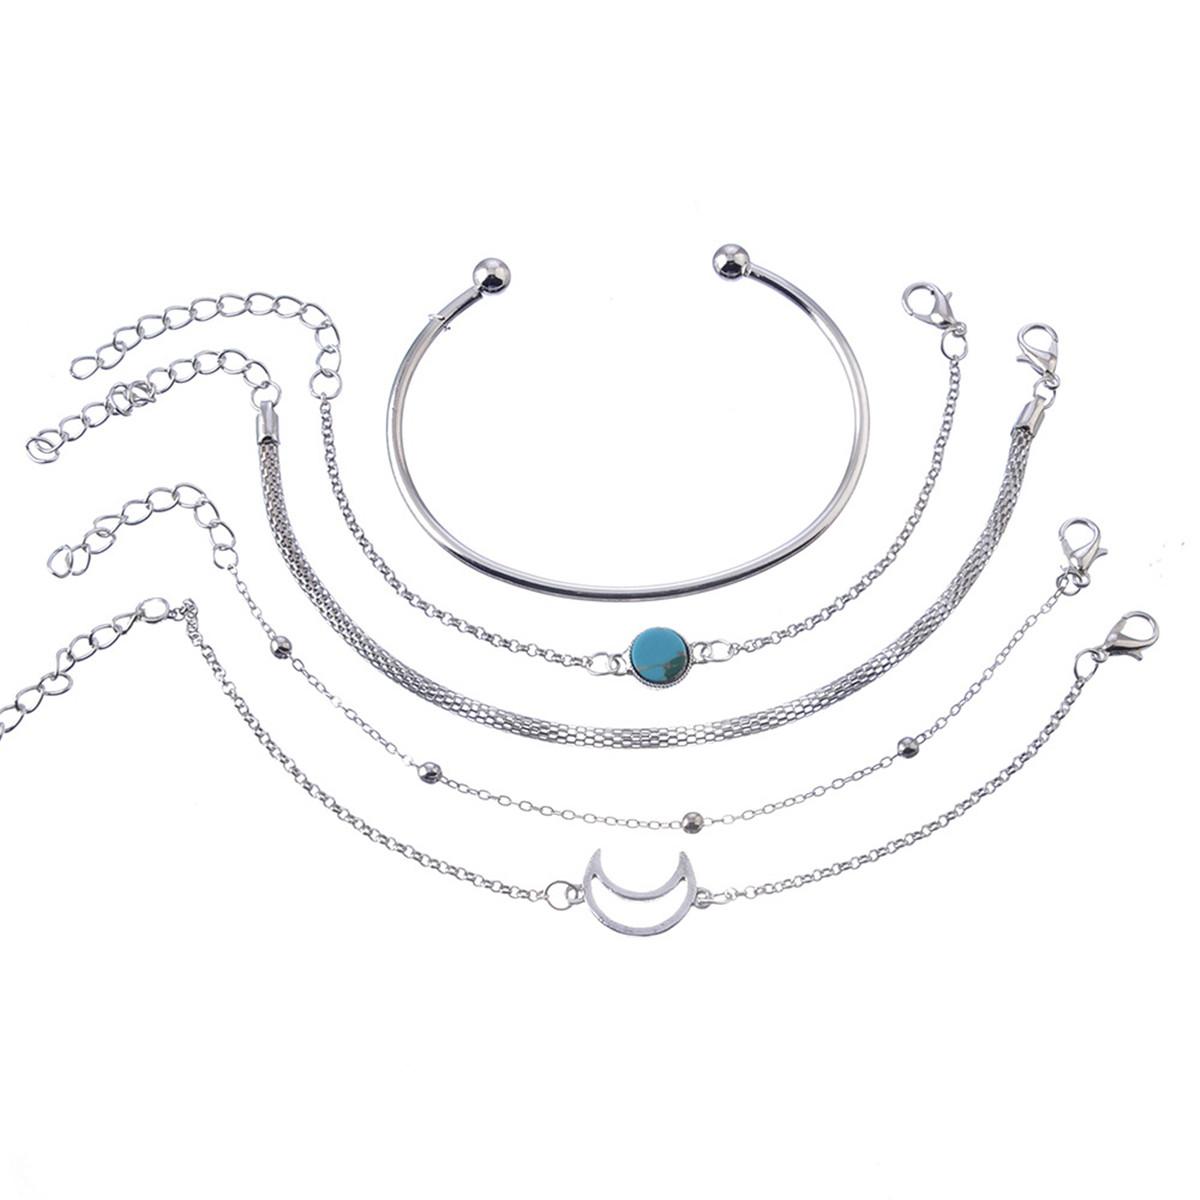 Inlaid Turquoise Simple Five Piece Set Hand Chain Nalaline